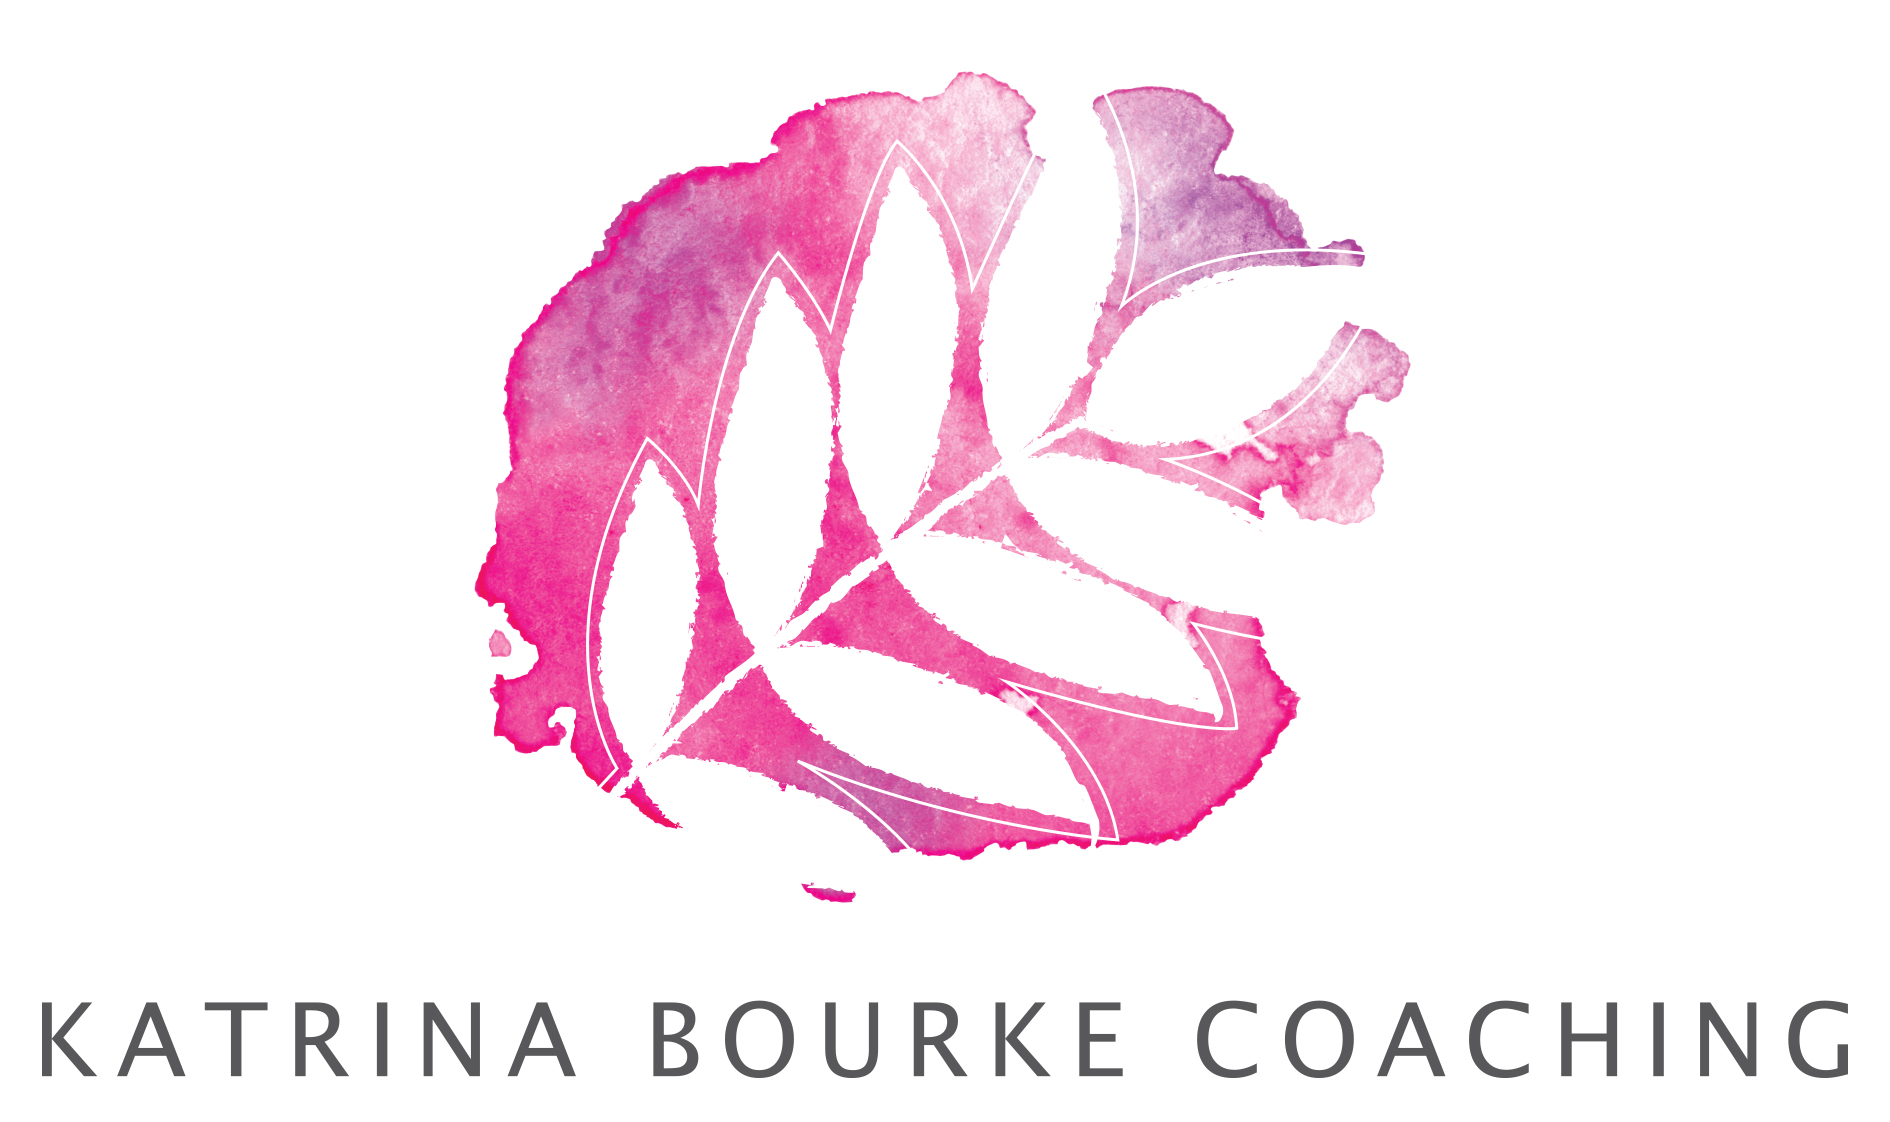 katrinabourkecoaching.com.au